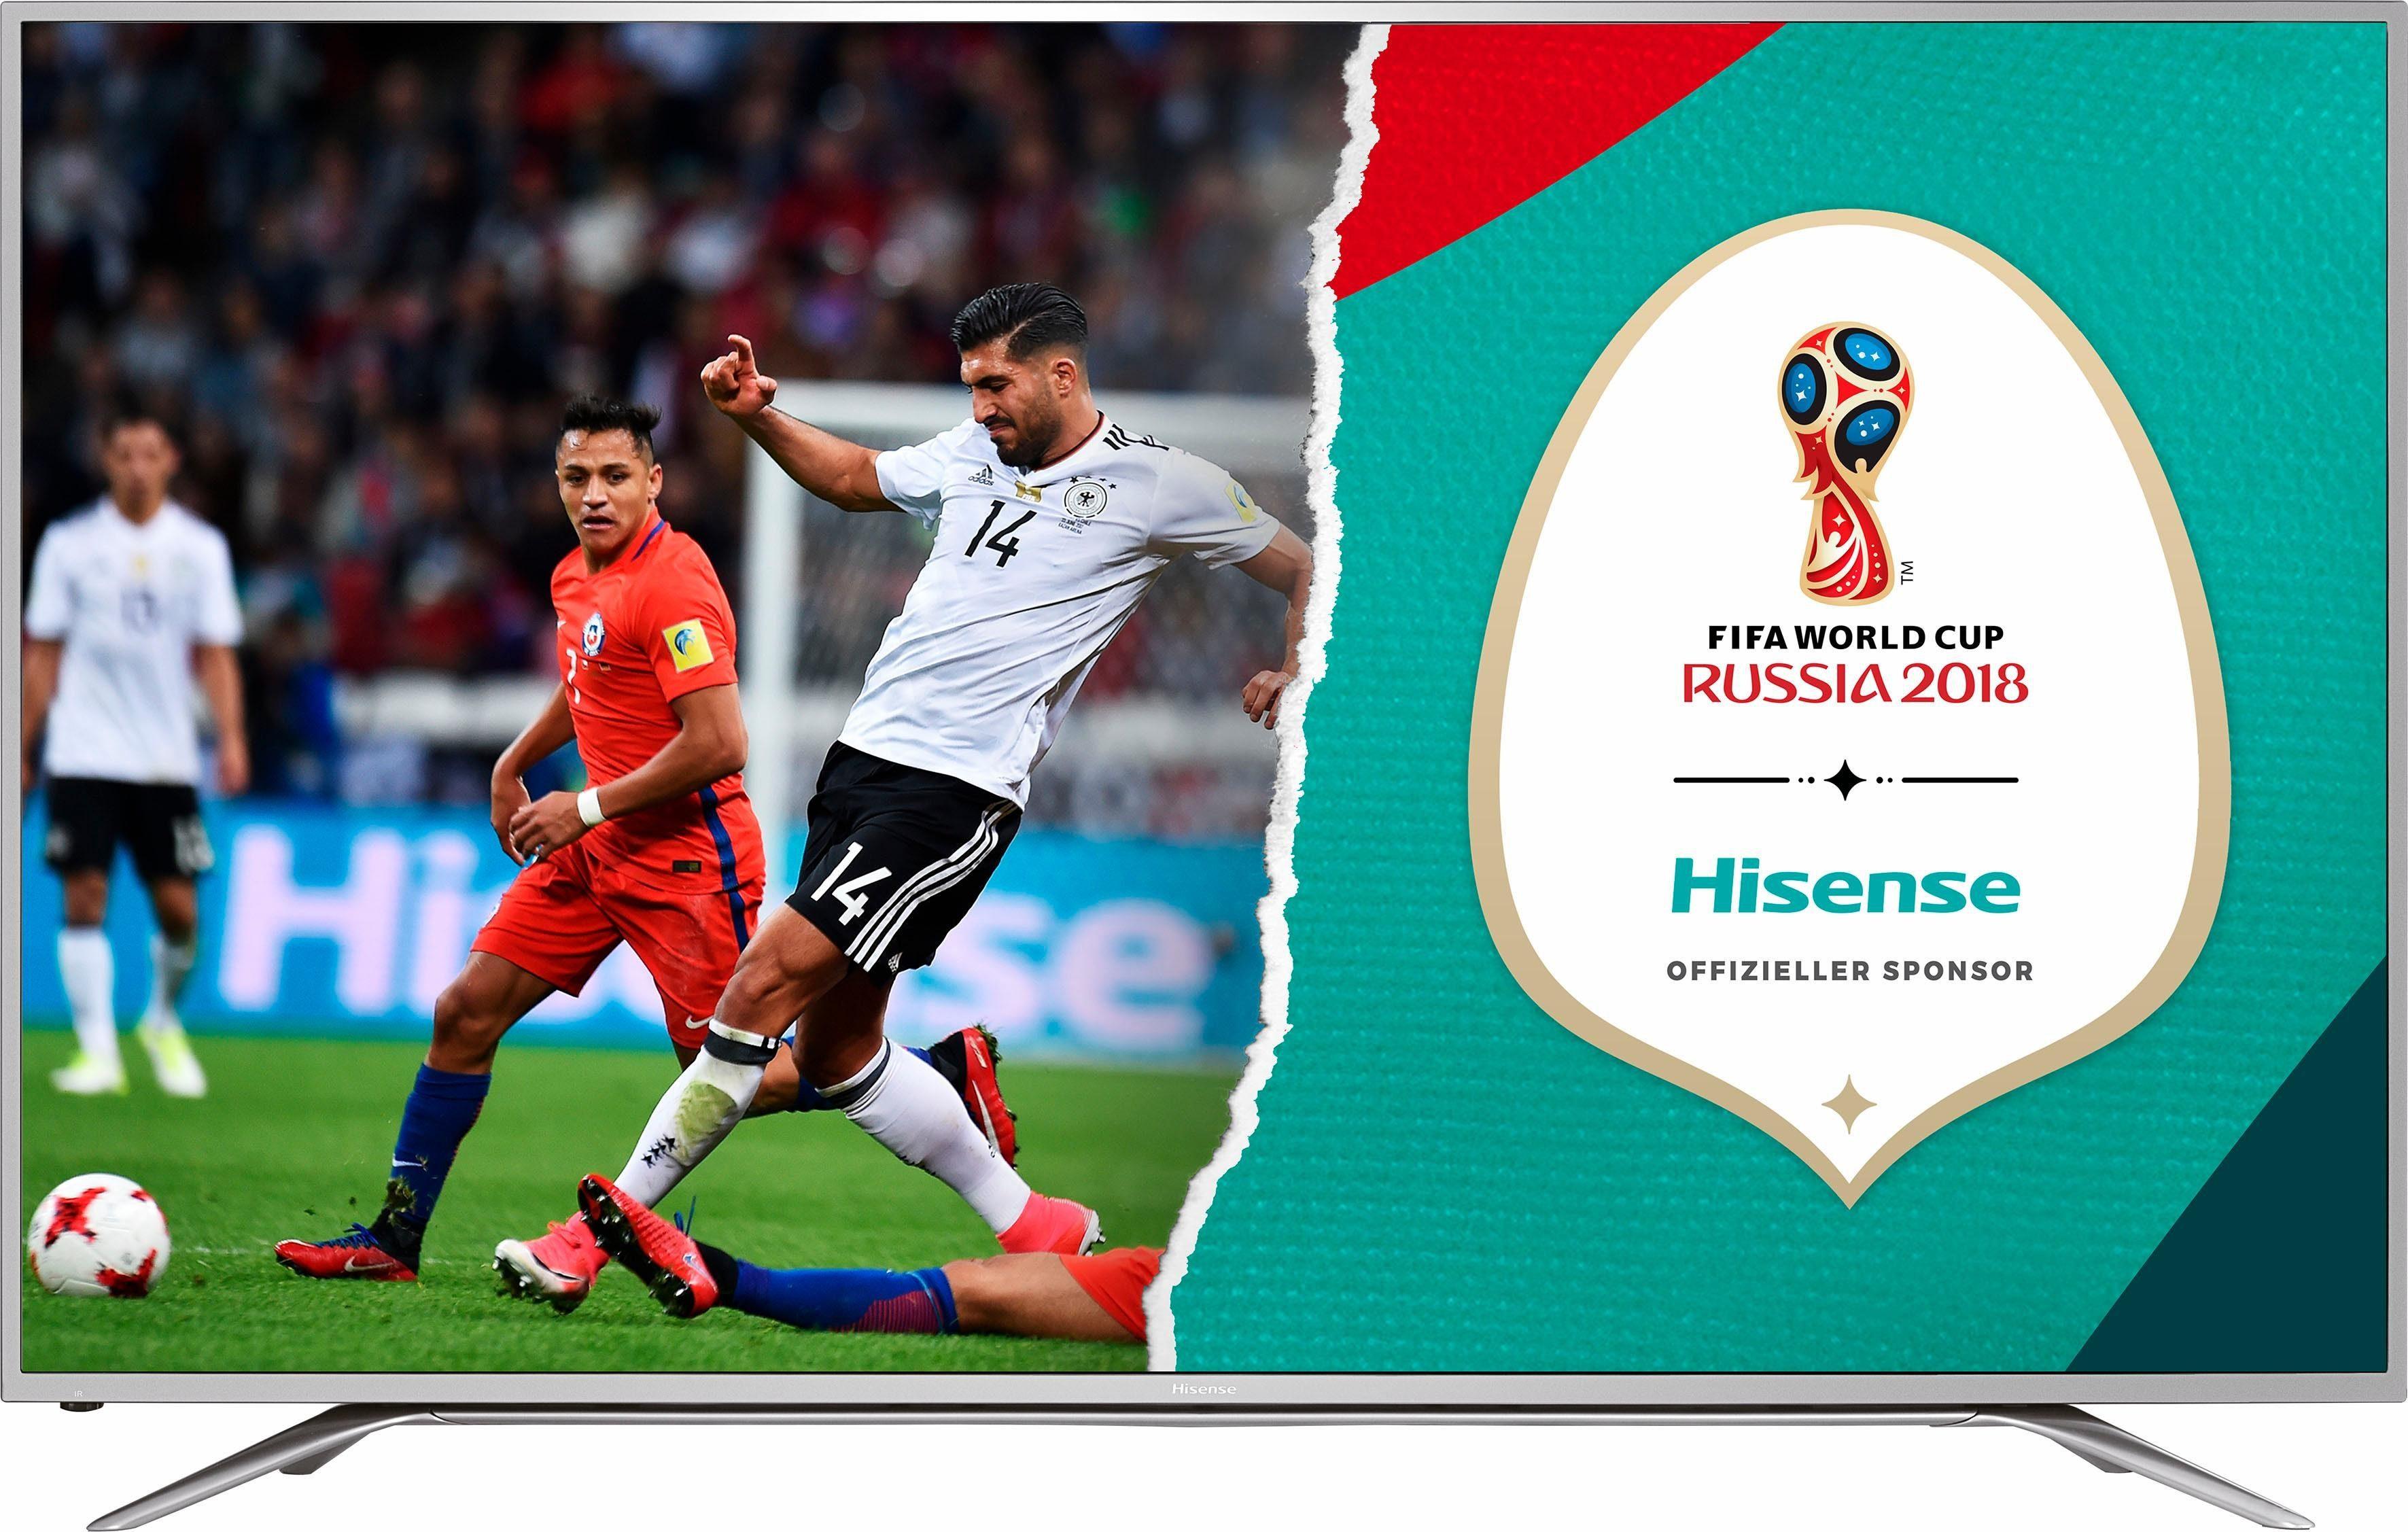 Hisense H65MEC5550, LED Fernseher, 163 cm (65 Zoll), 2160p (4K Ultra HD), Smart-TV